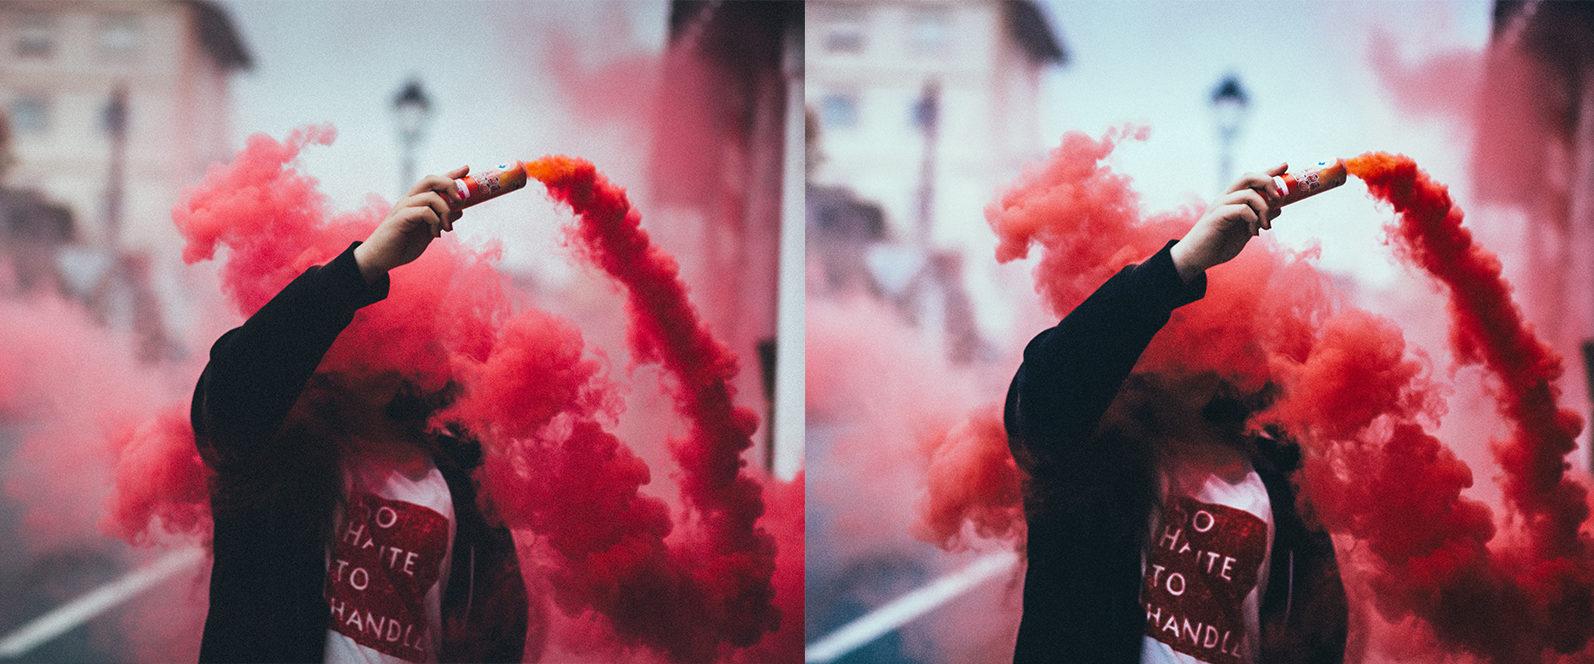 12 Smoke Bomb Lightroom Presets to enhance your Smoke Bomb Photoshoots - Preview 7 6 -